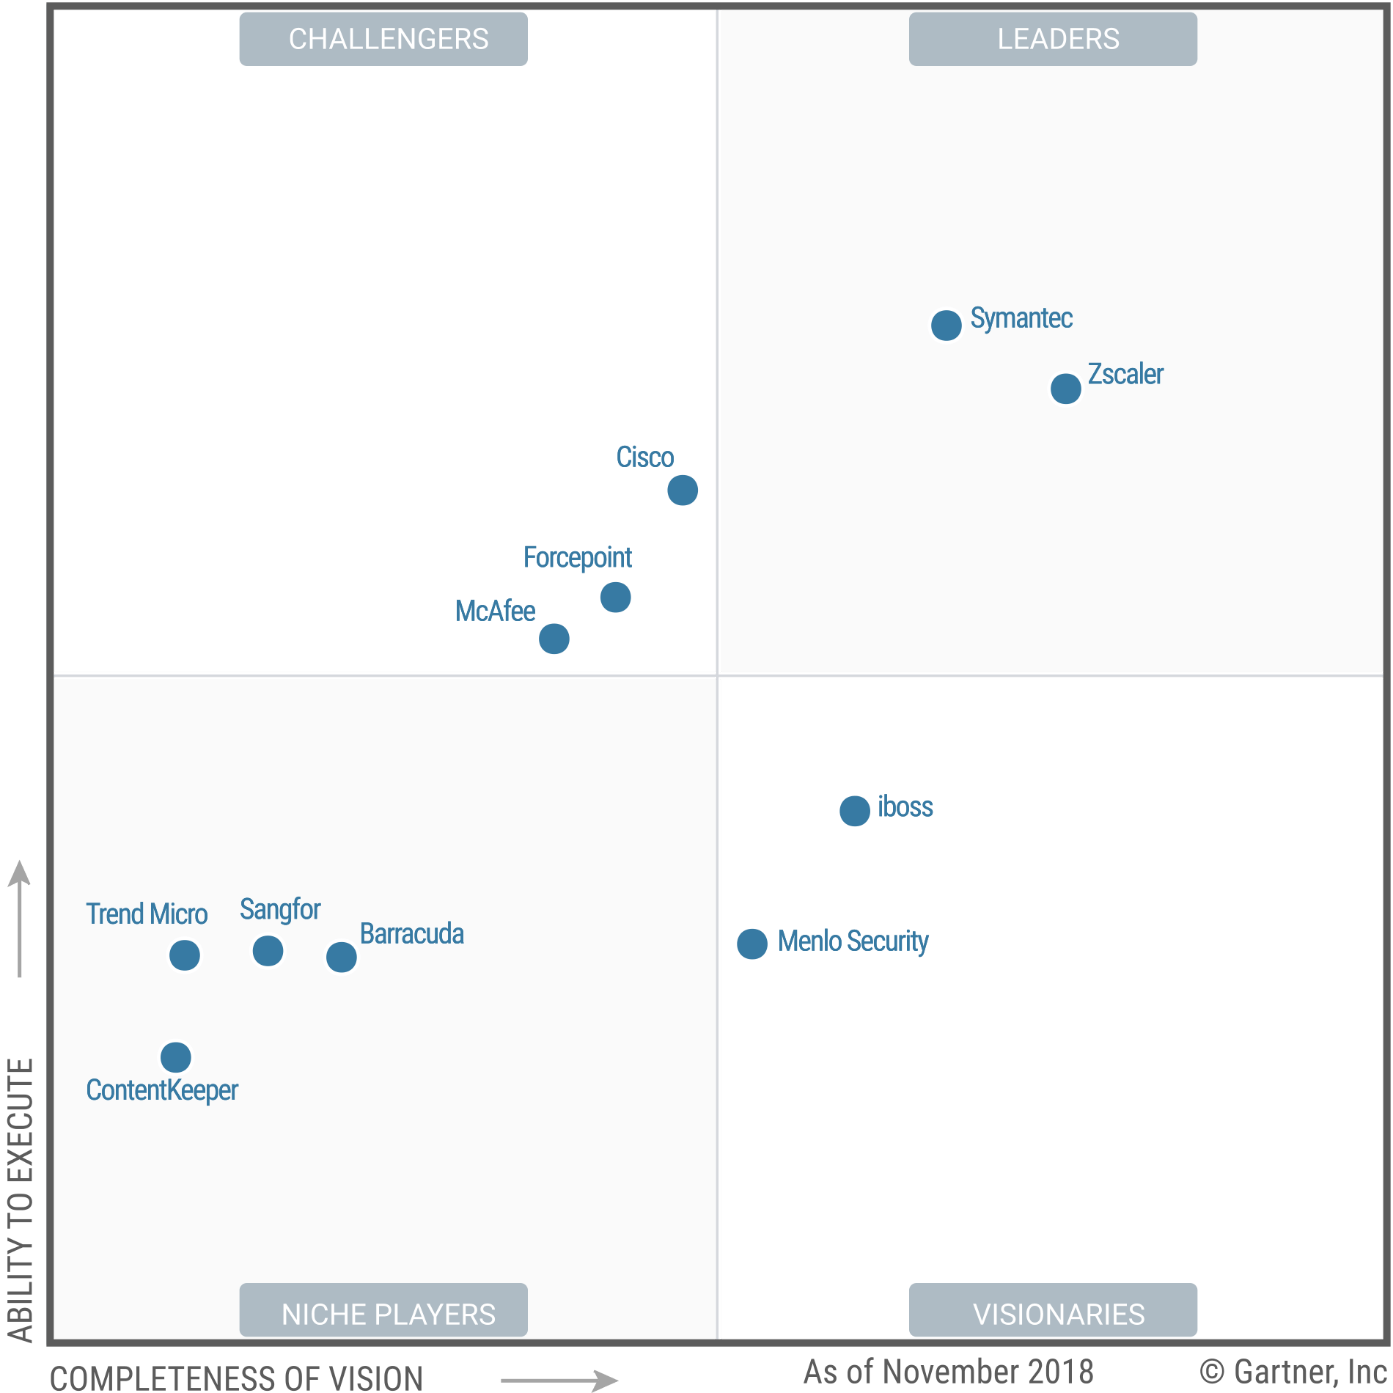 Magic Quadrant for Secure Web Gateways 2018 (G00335718)